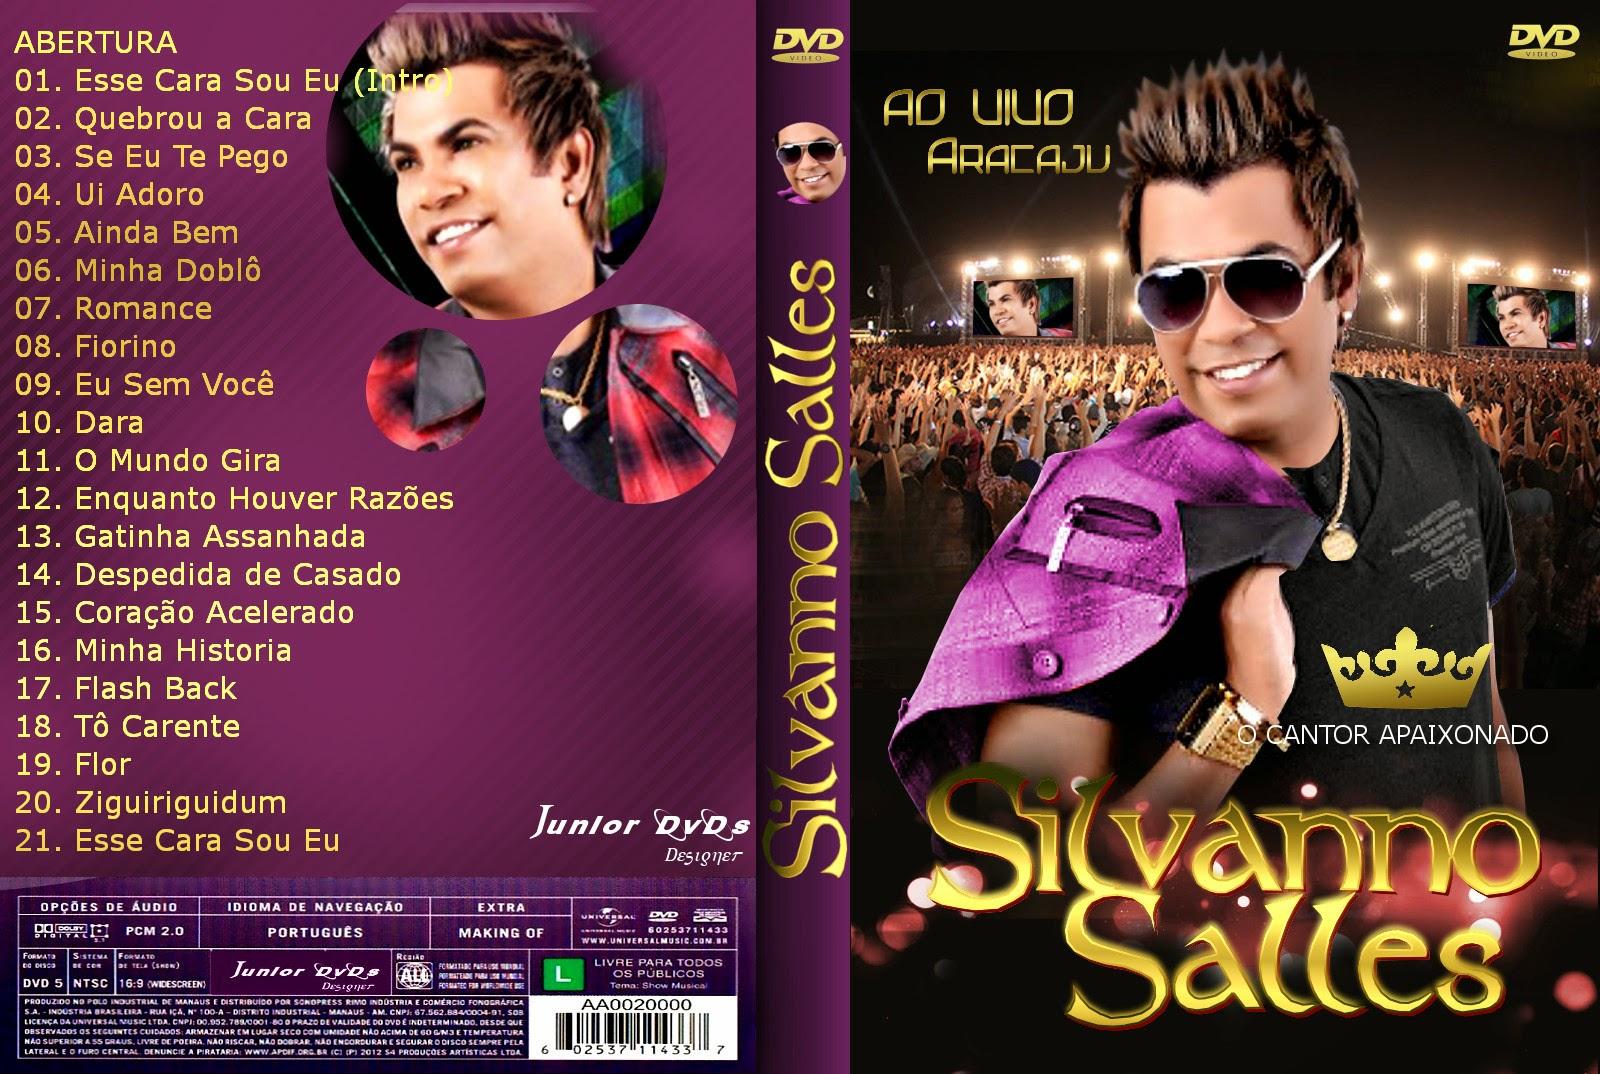 capa Download – Silvanno Salles   O Cantor Apaixonado   Ao Vivo Aracaju – DVDRip AVI + RMVB ( 2014 )